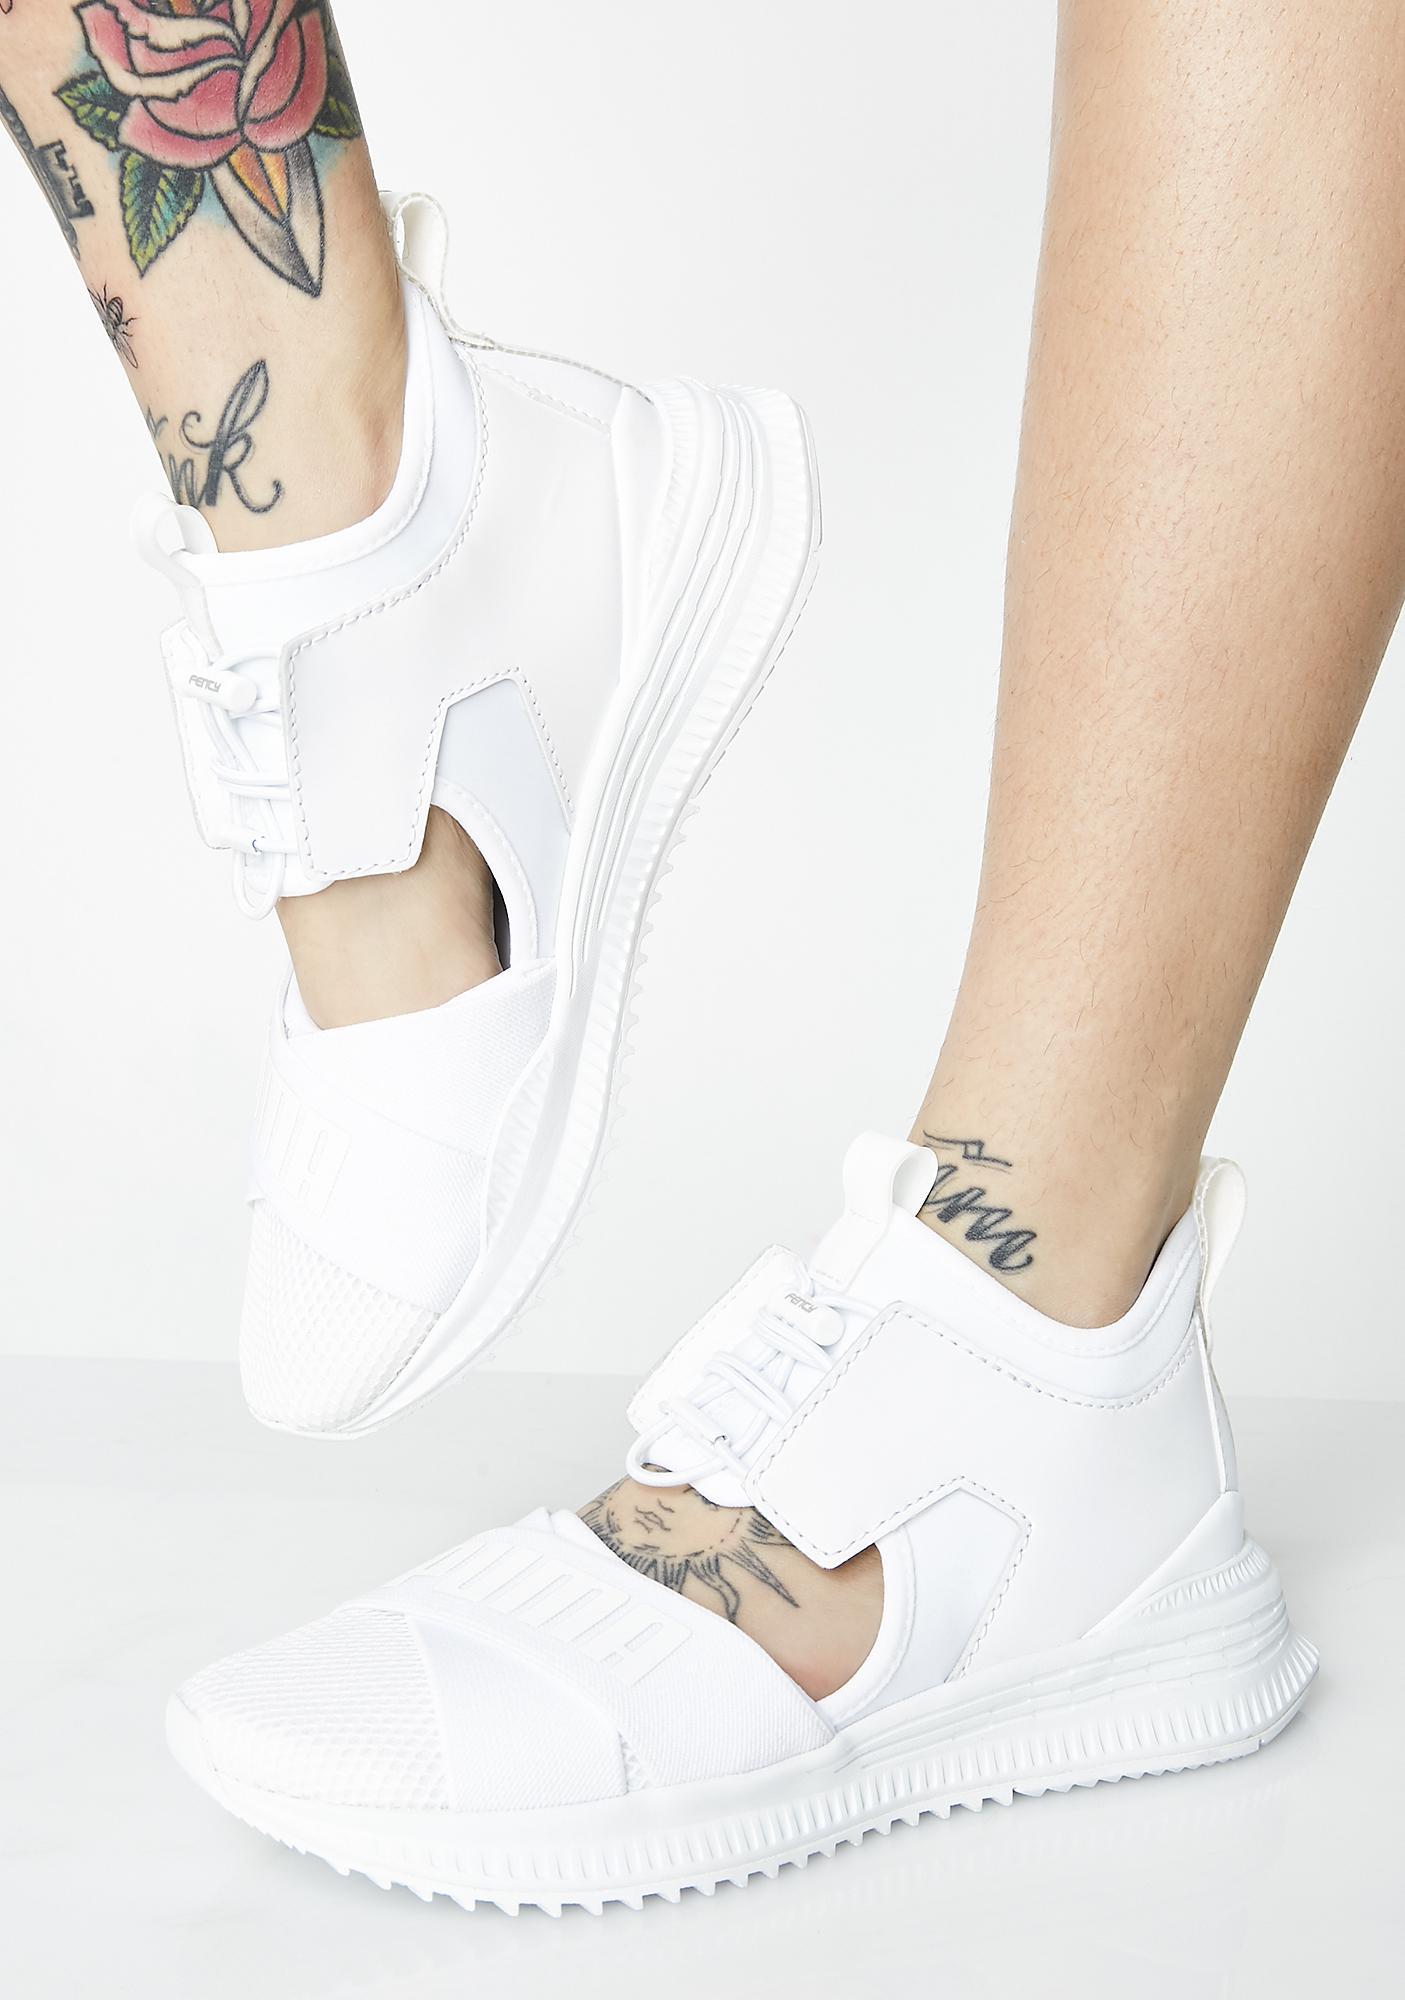 meet 20445 3d375 Pure FENTY PUMA by Rihanna Avid Sneakers